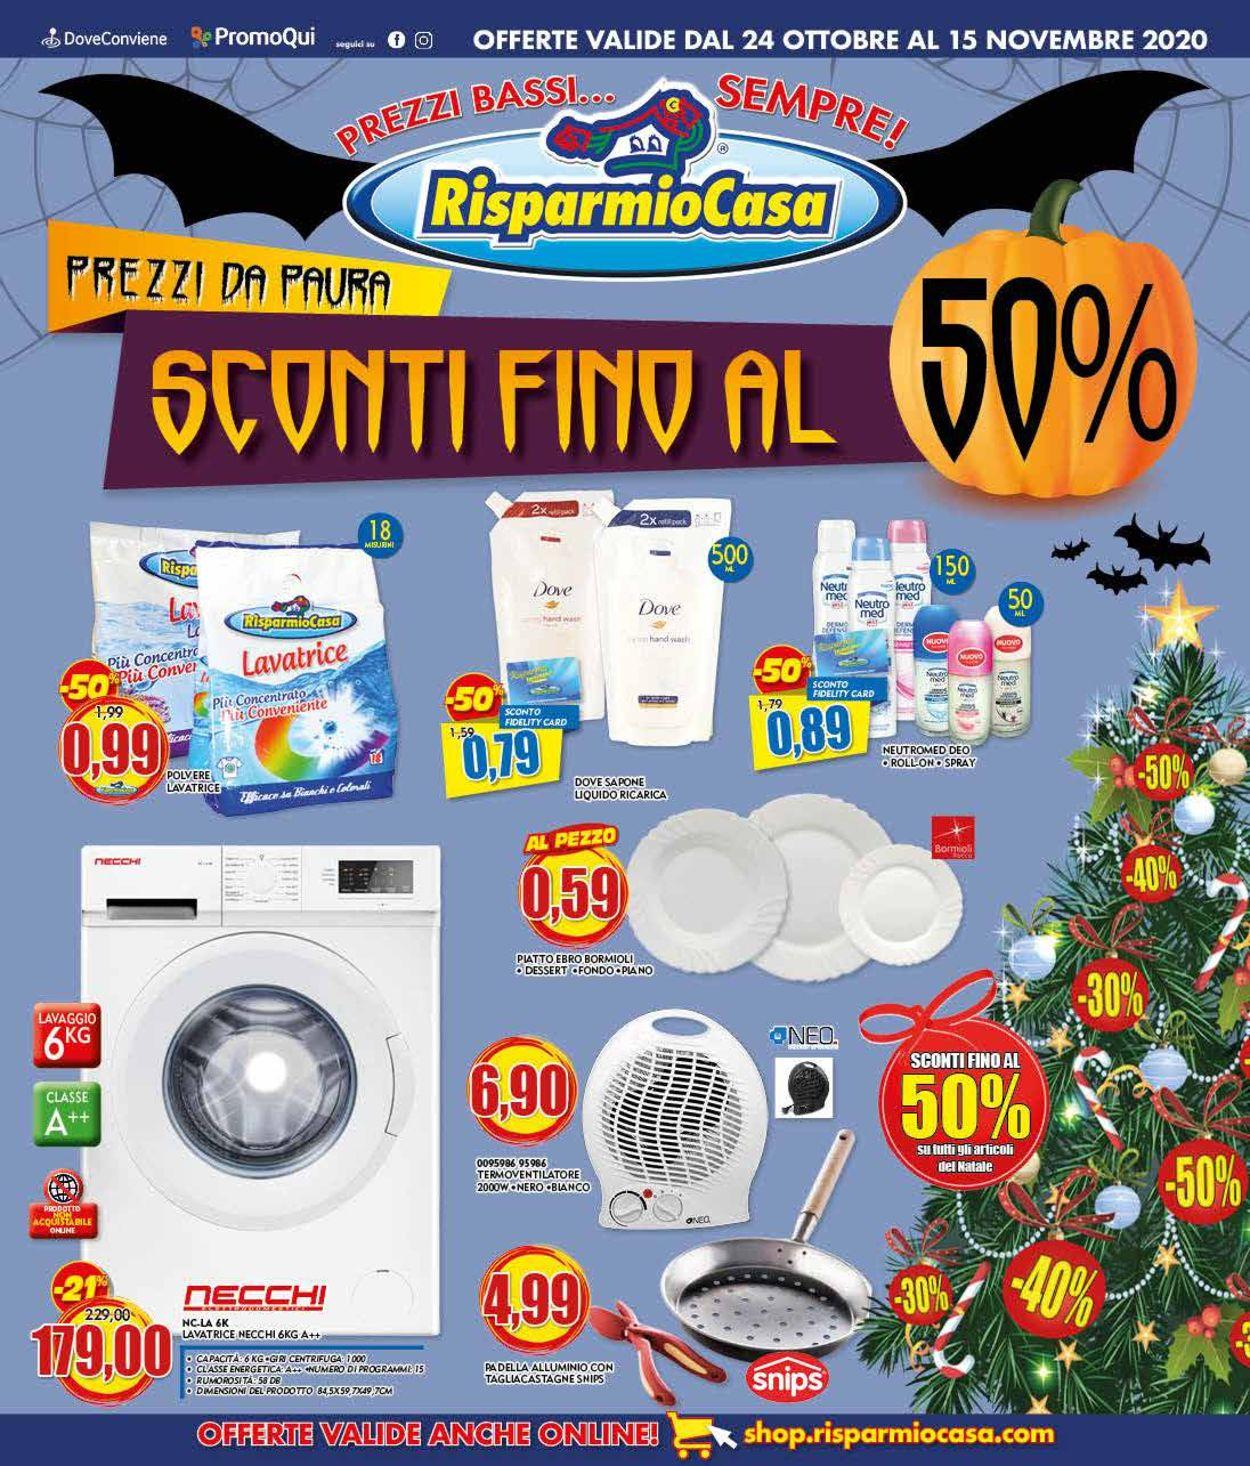 Volantino Risparmio Casa - Offerte 24/10-15/11/2020